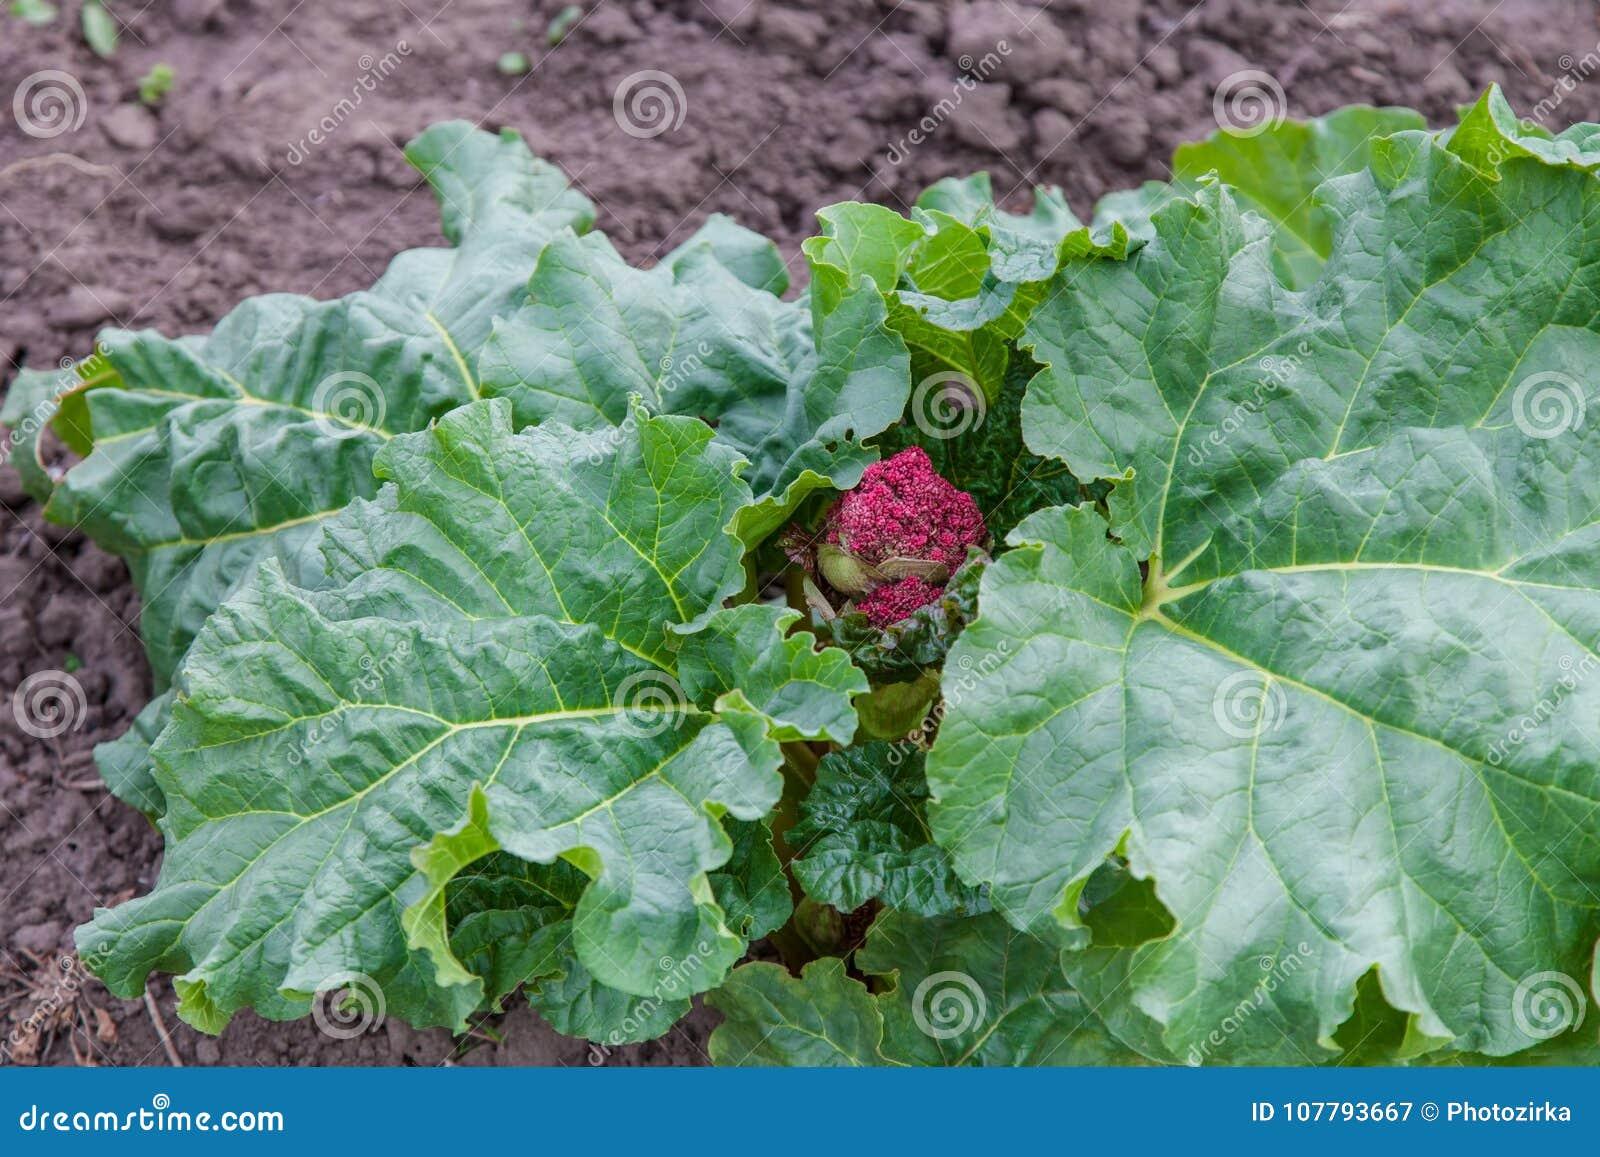 Debuts De Bourgeon De Rhubarbe A La Fleur Image Stock Image Du